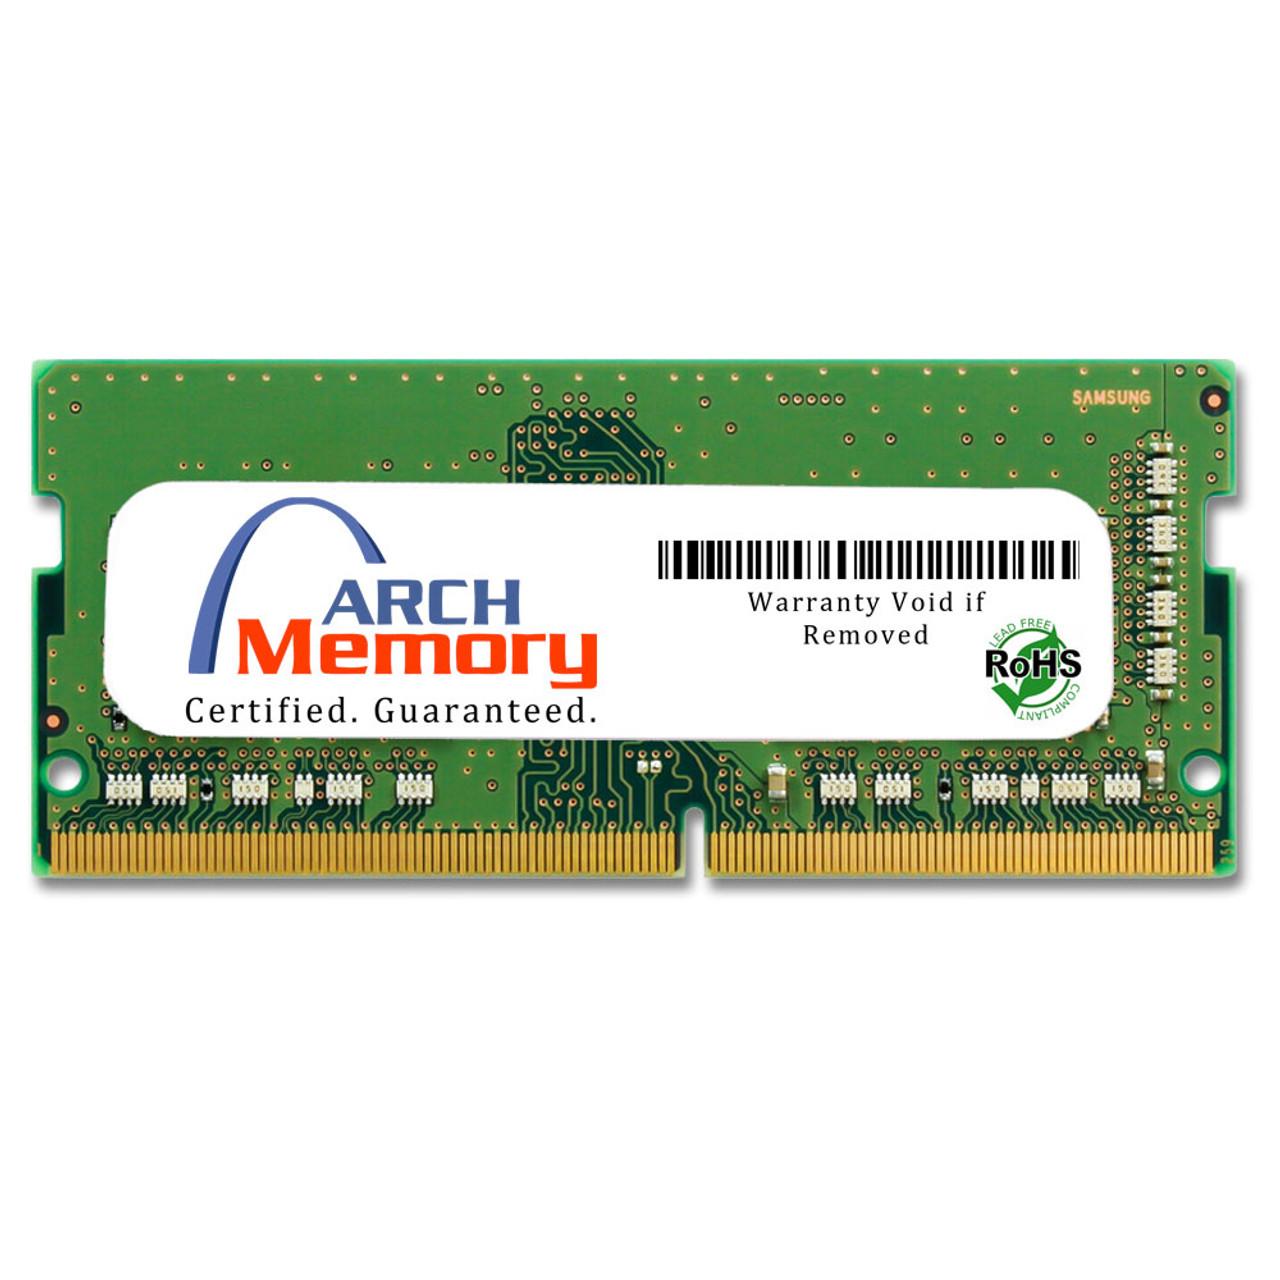 8GB DDR4-2400 PC4-12900 260 Pin Sodimm RAM Memory